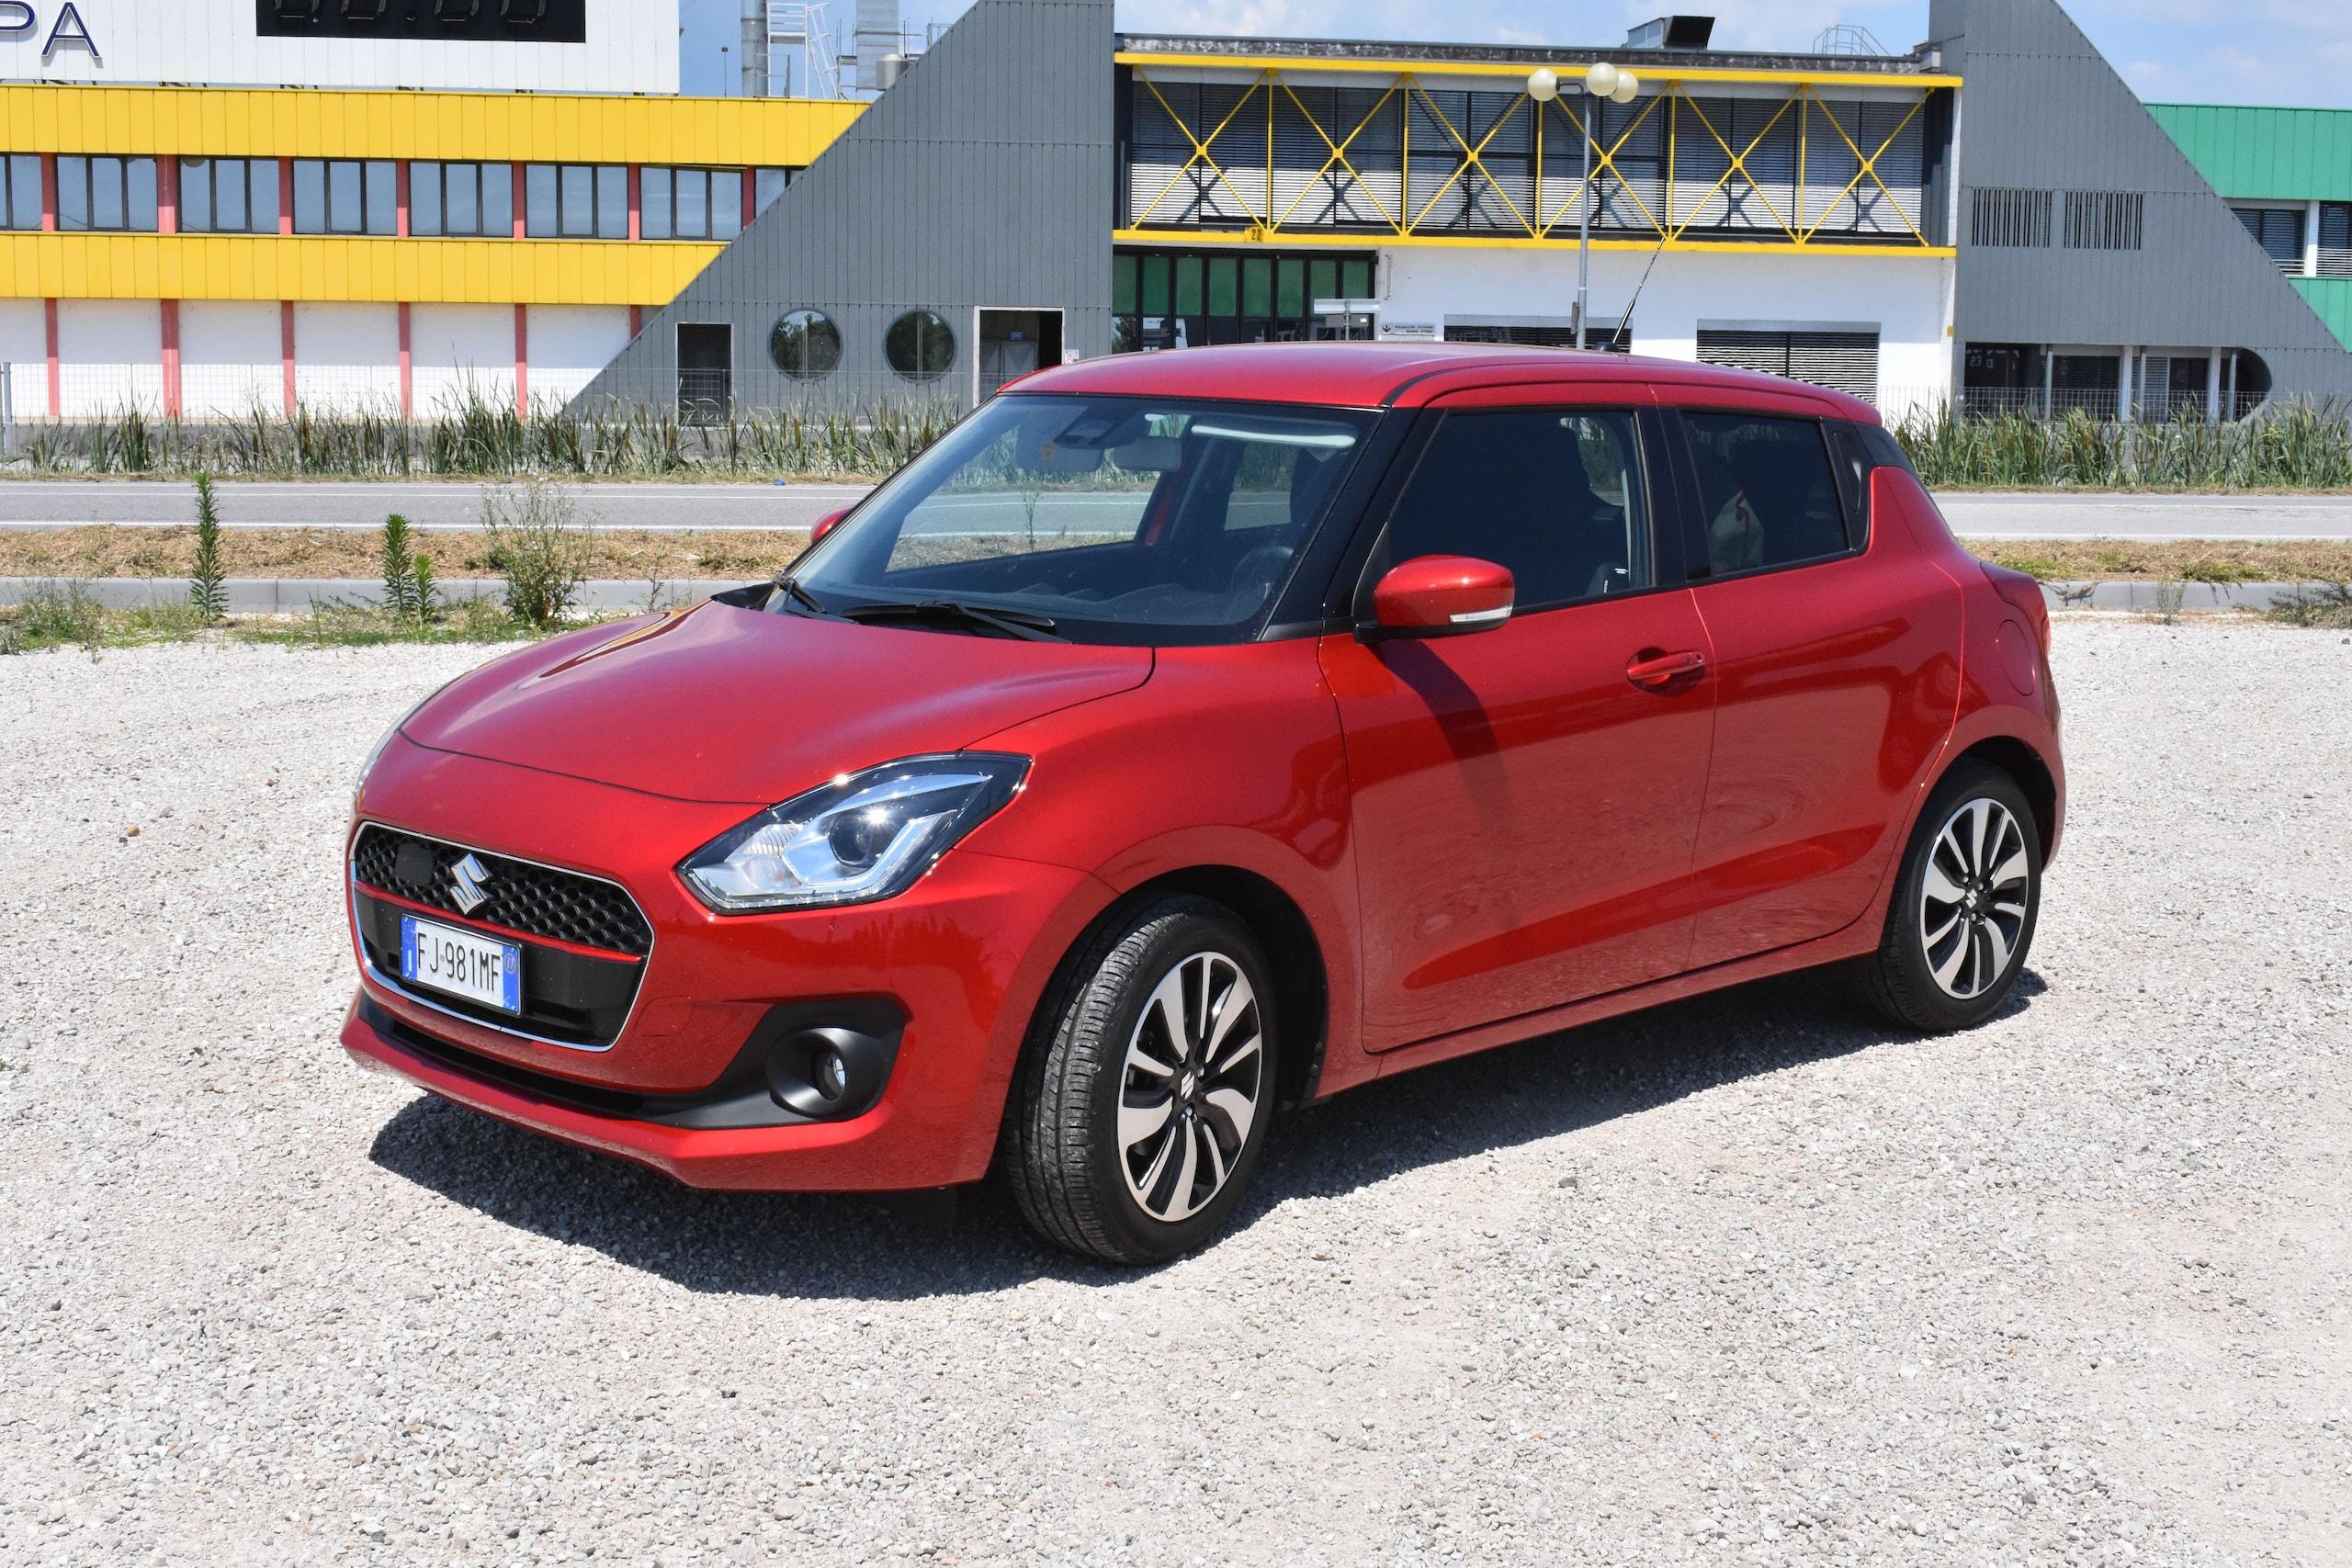 Test comparato: Suzuki Swift Hybrid - Kia Nito Hybrid